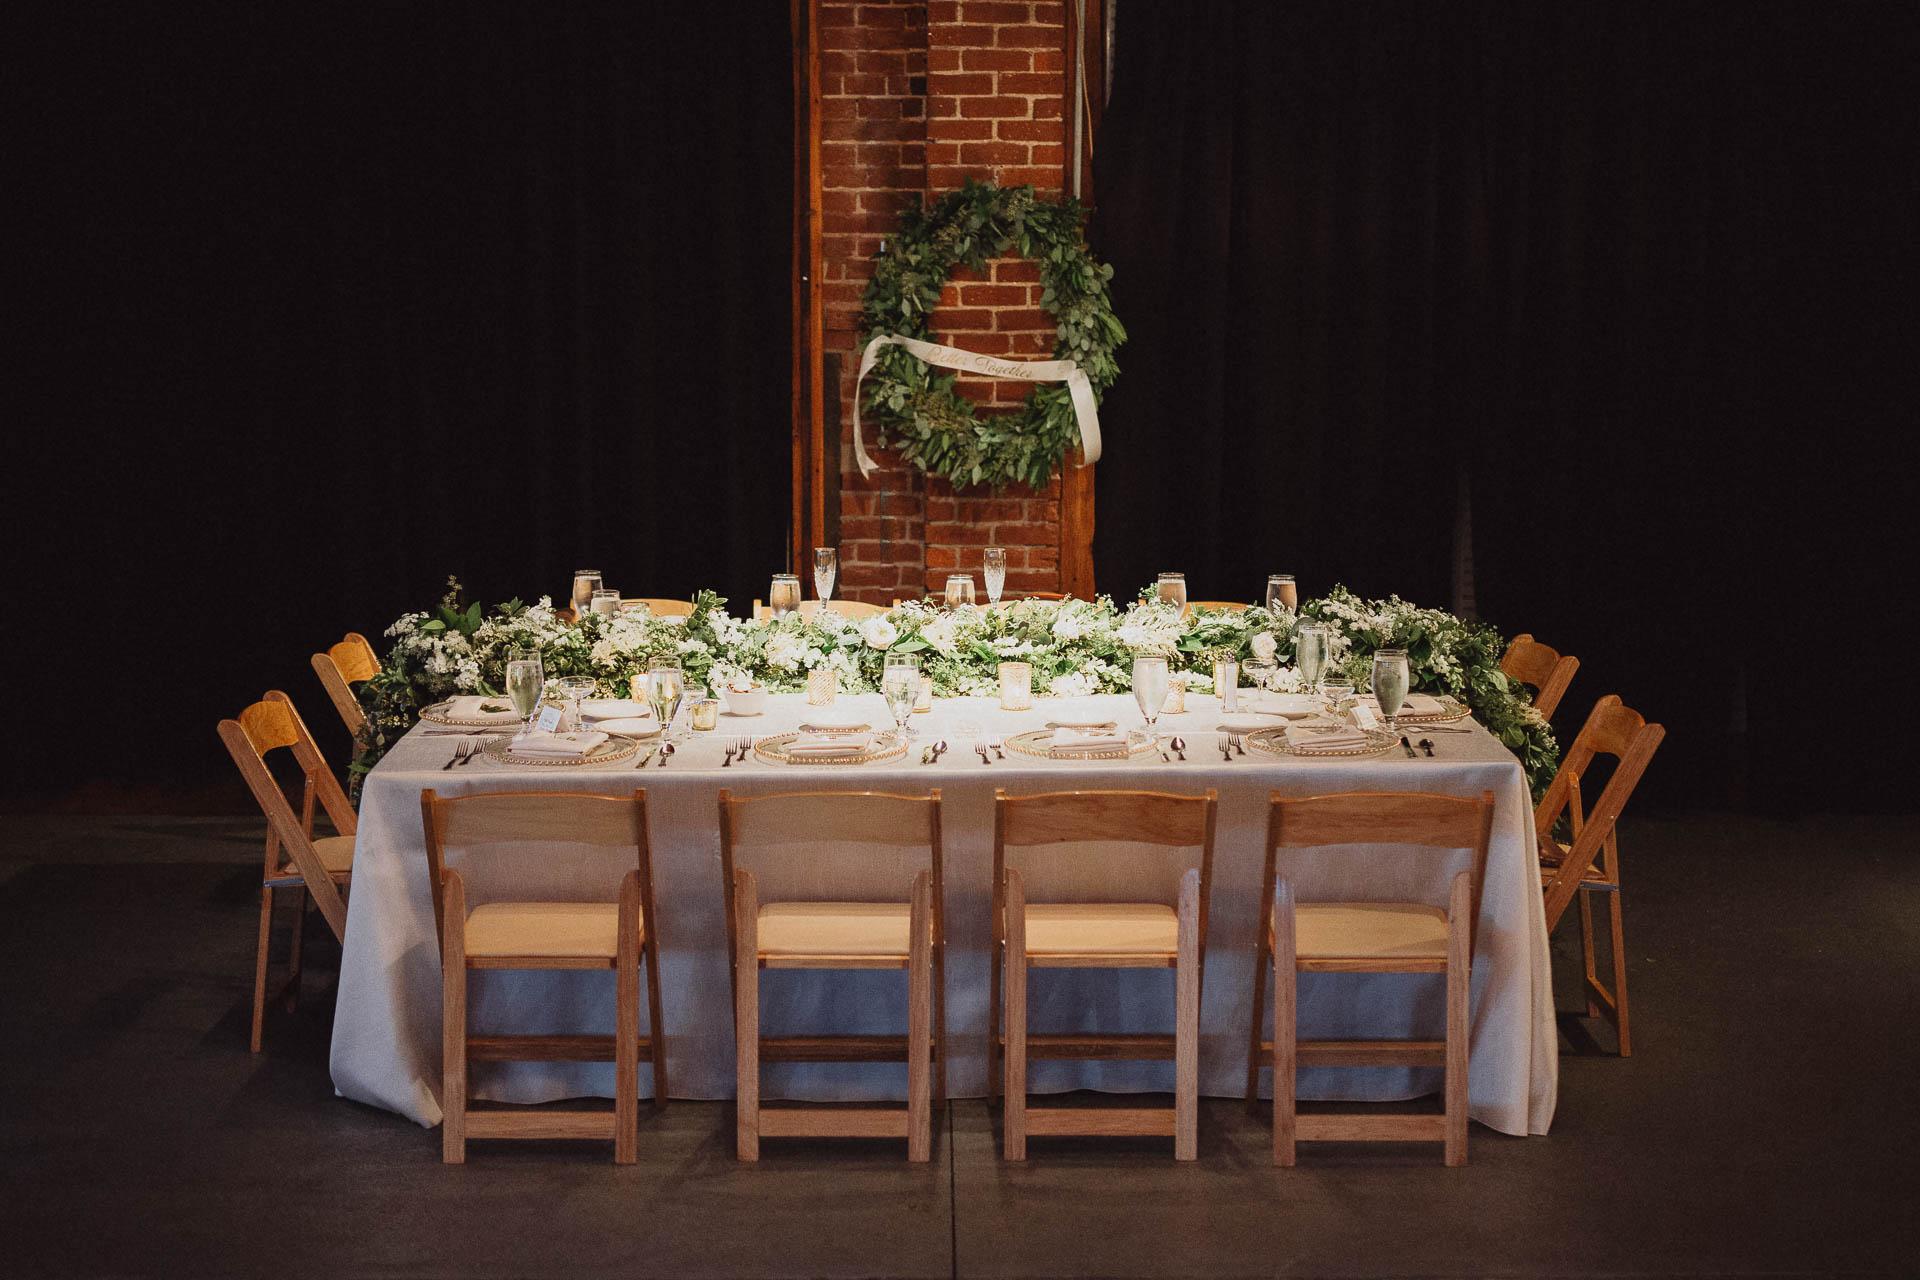 Keri-Joseph-Top-of-the-Market-Wedding-209@2x.jpg